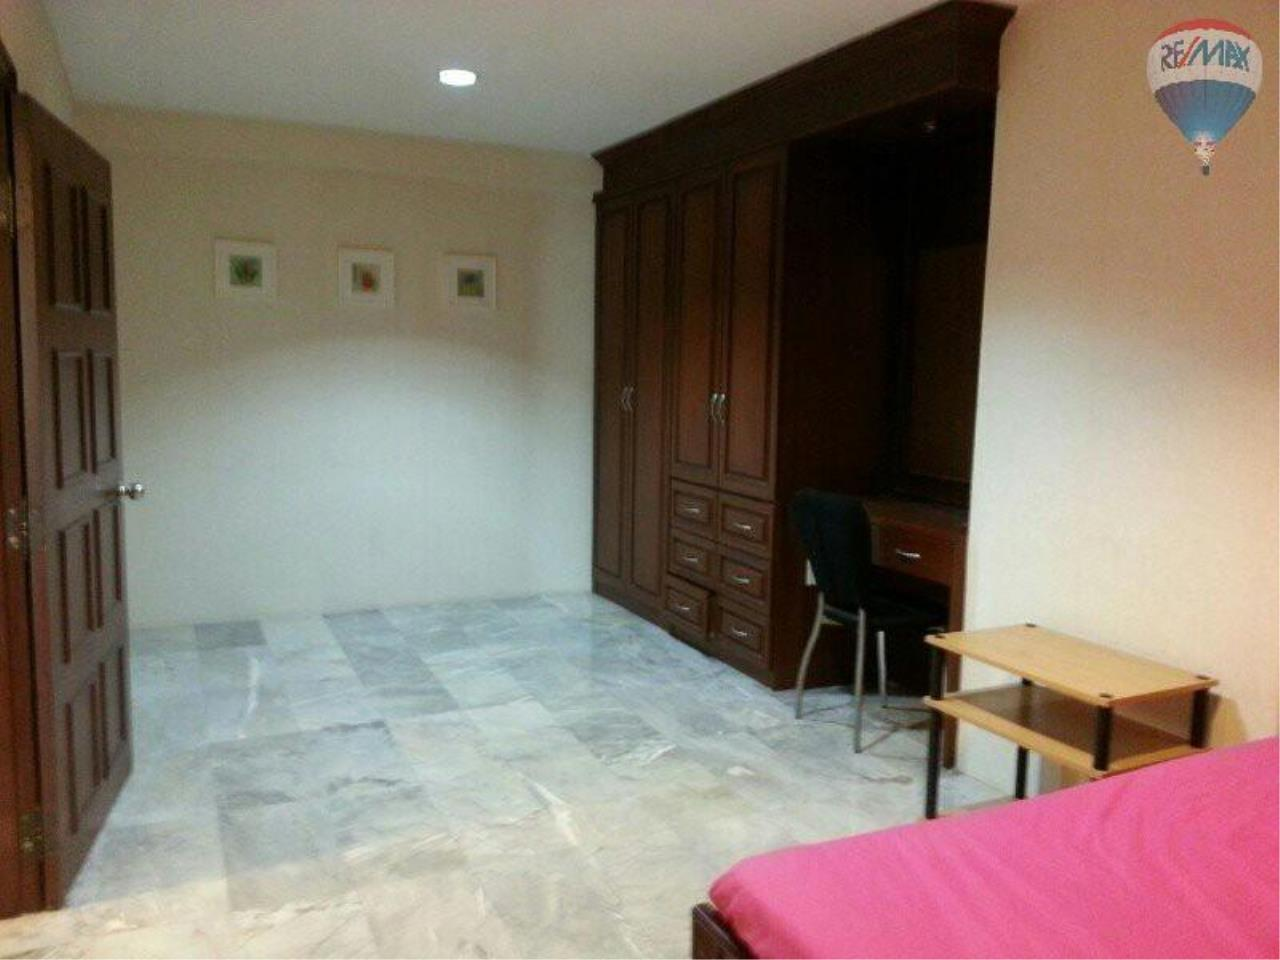 RE/MAX Properties Agency's 1 Bedroom 56 Sq.m for SALE at Saranjai Mansion,Sukhumvit Soi 4 (Nana) 4